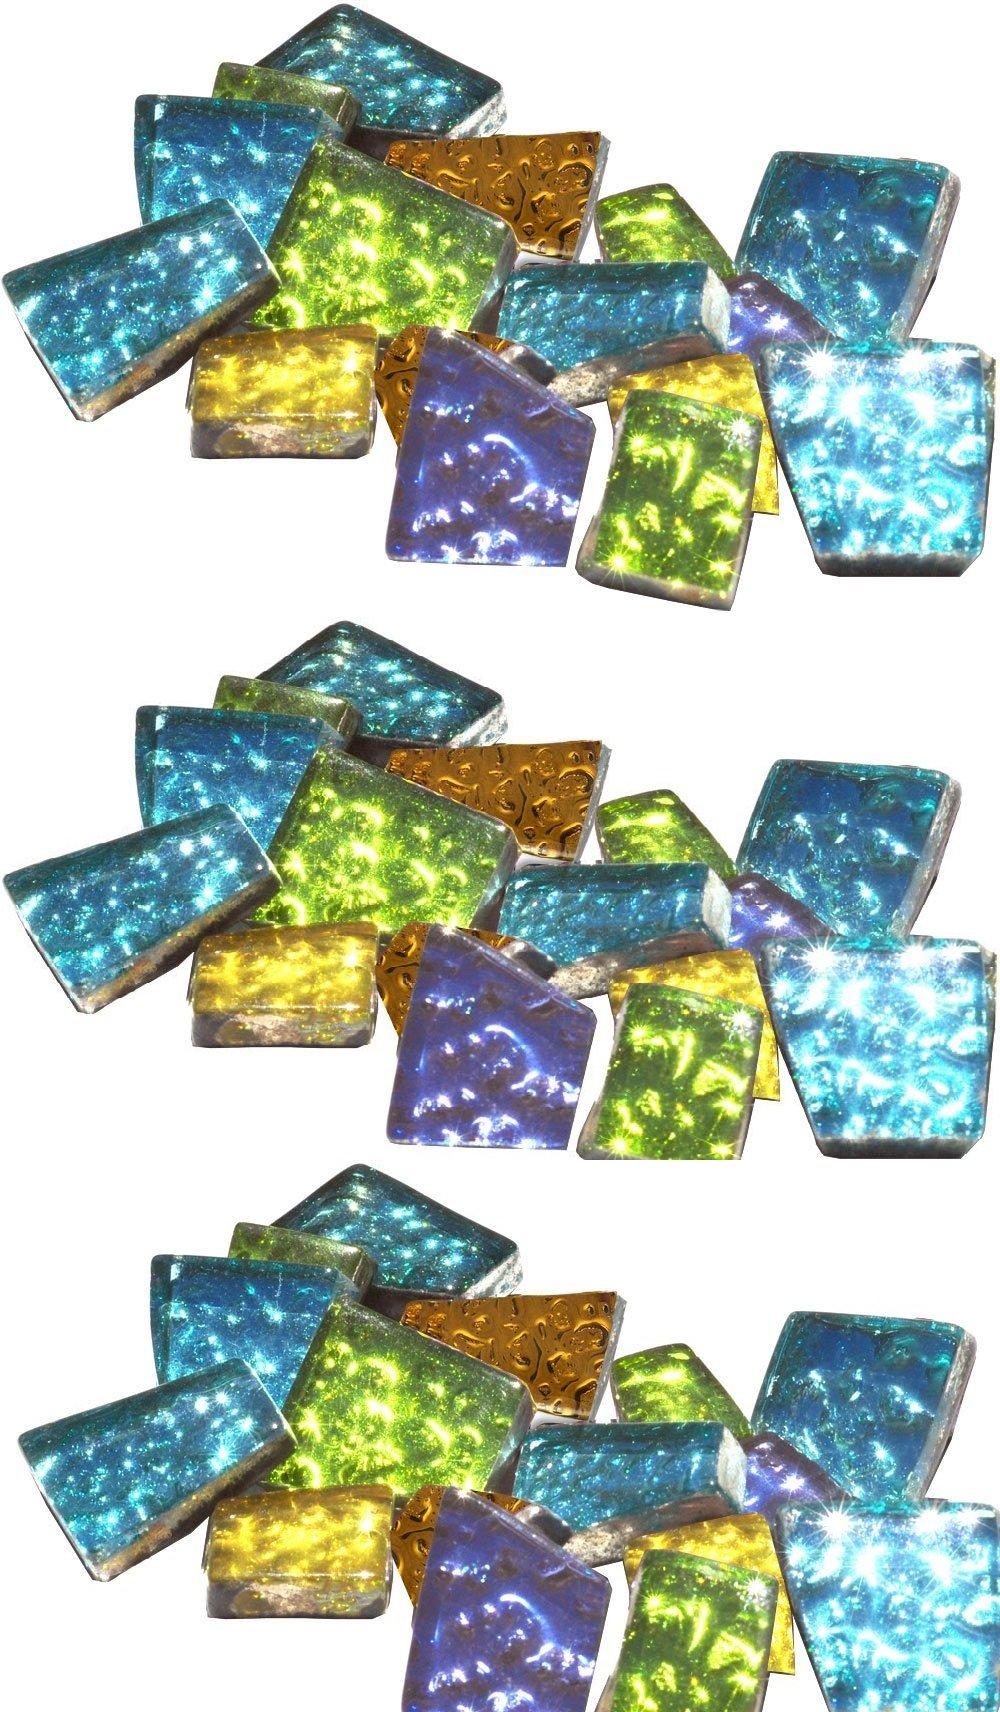 Mosaic Mercantile Sparkle Assorted Mosaic Tile, 1/2-Pound (3 Pack)